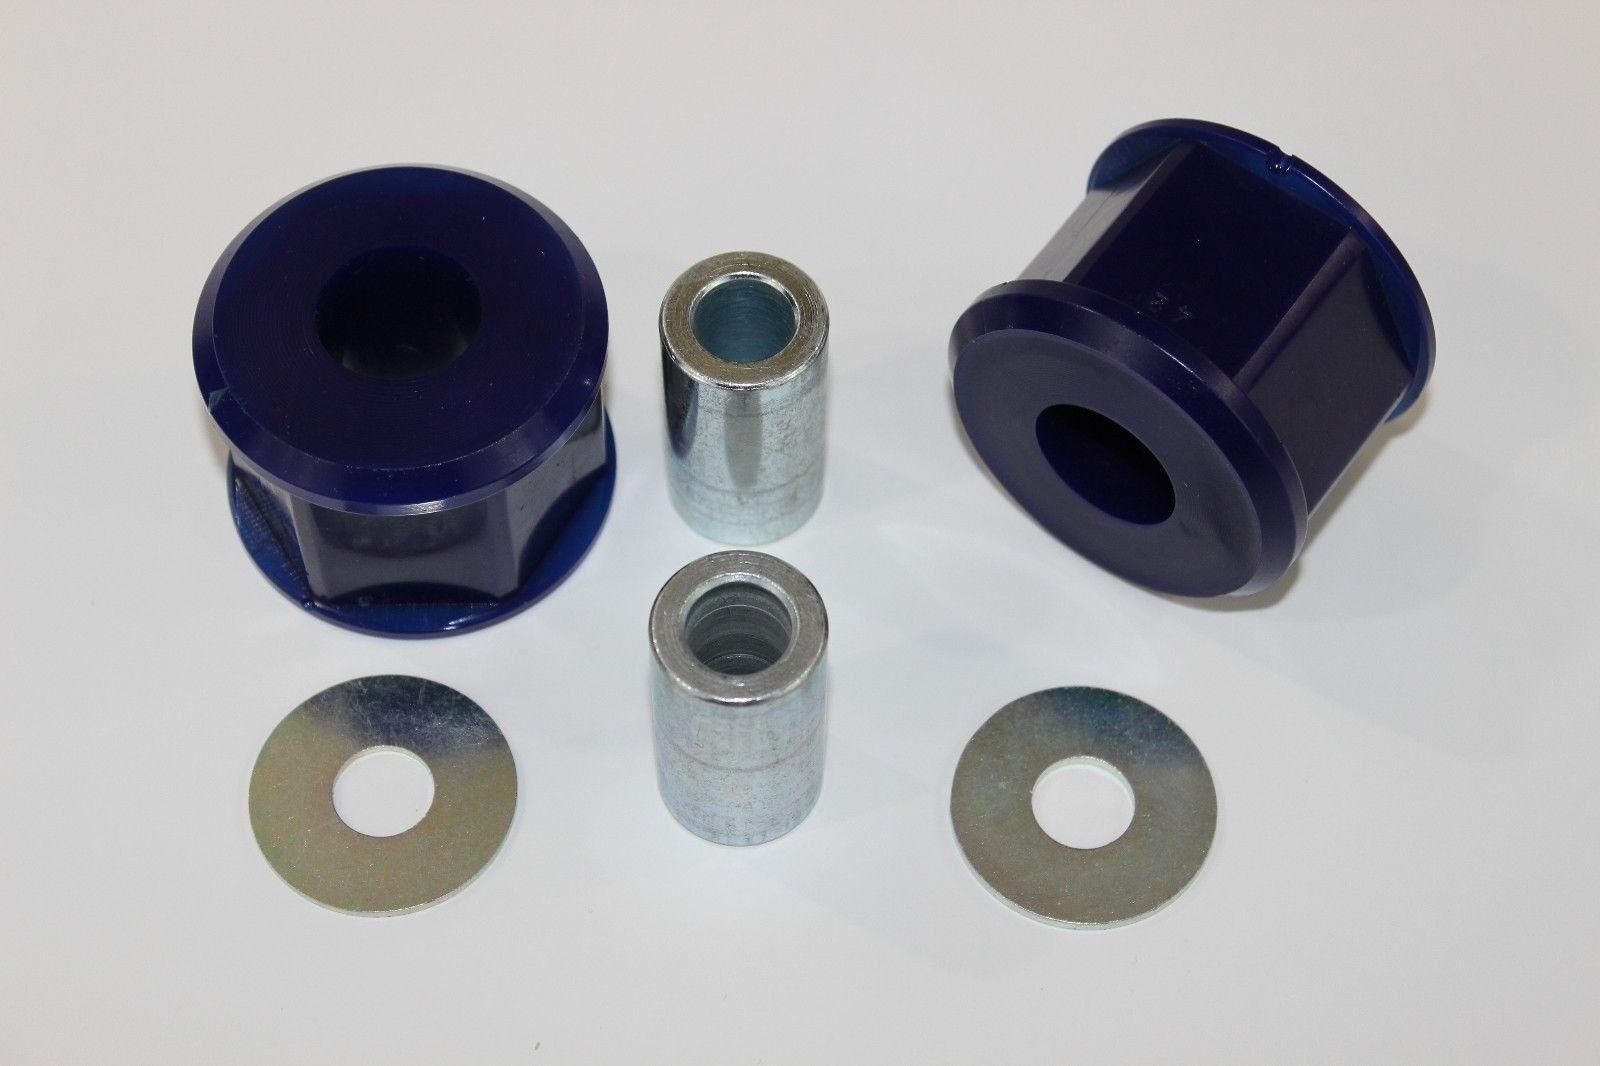 Set 4pcs NGK Laser Iridium Spark Plugs Stock 7287 Nickel Core Tip Standard 0.052in ITR5H13